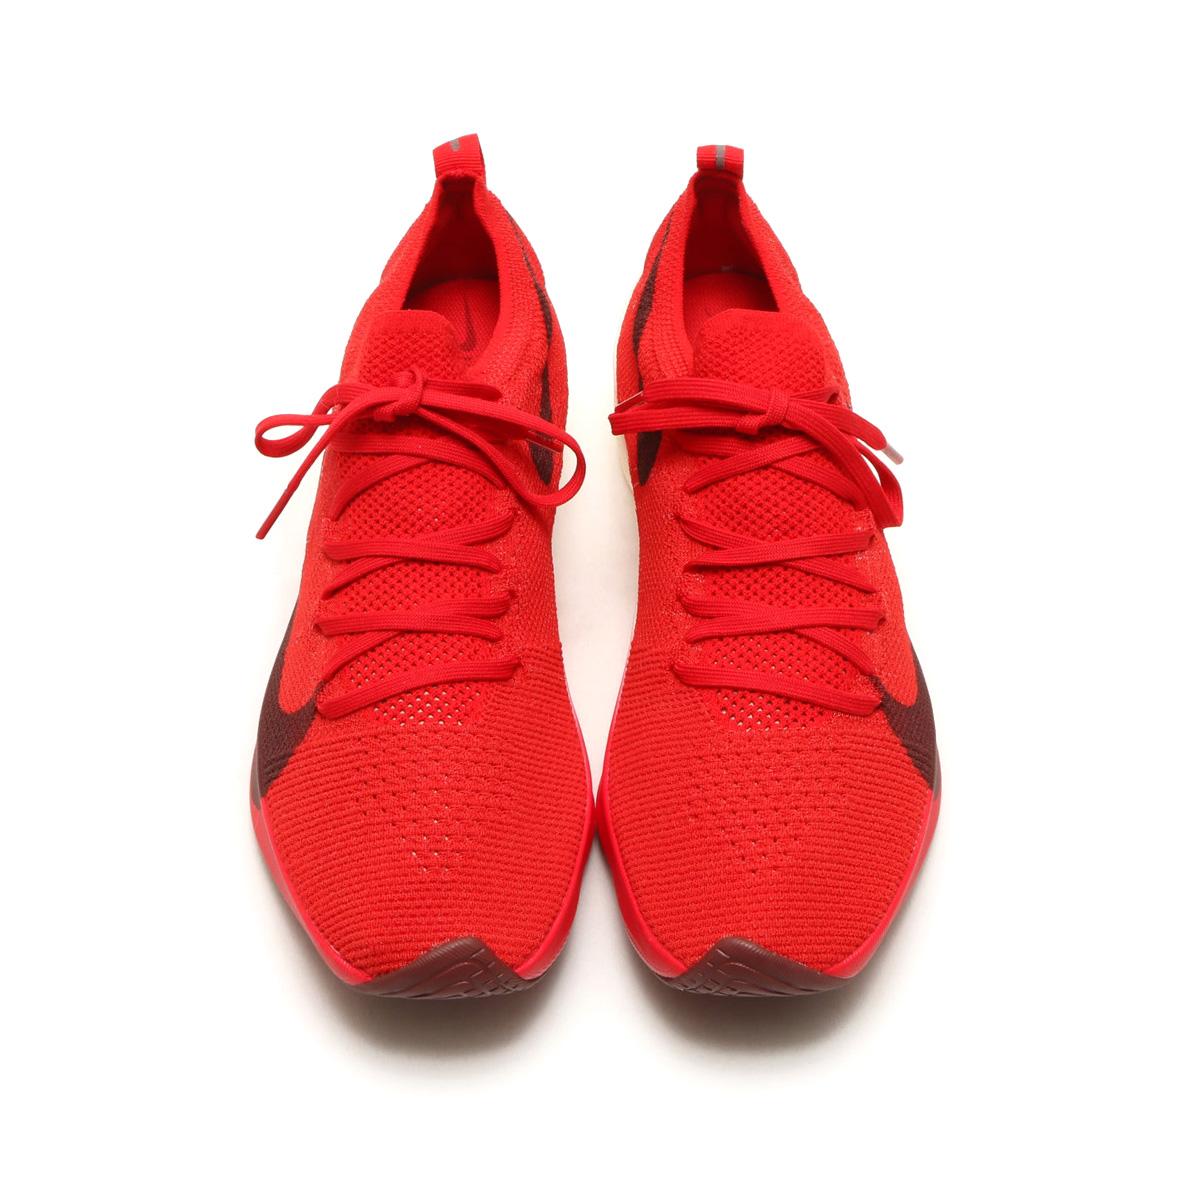 9b661f6ab6a2 NIKE VAPOR STREET FLYKNIT (Nike vapor street fried food knit) UNIVERSITY RED  DARK TEAM RED-SAIL-BLACK 18SP-S